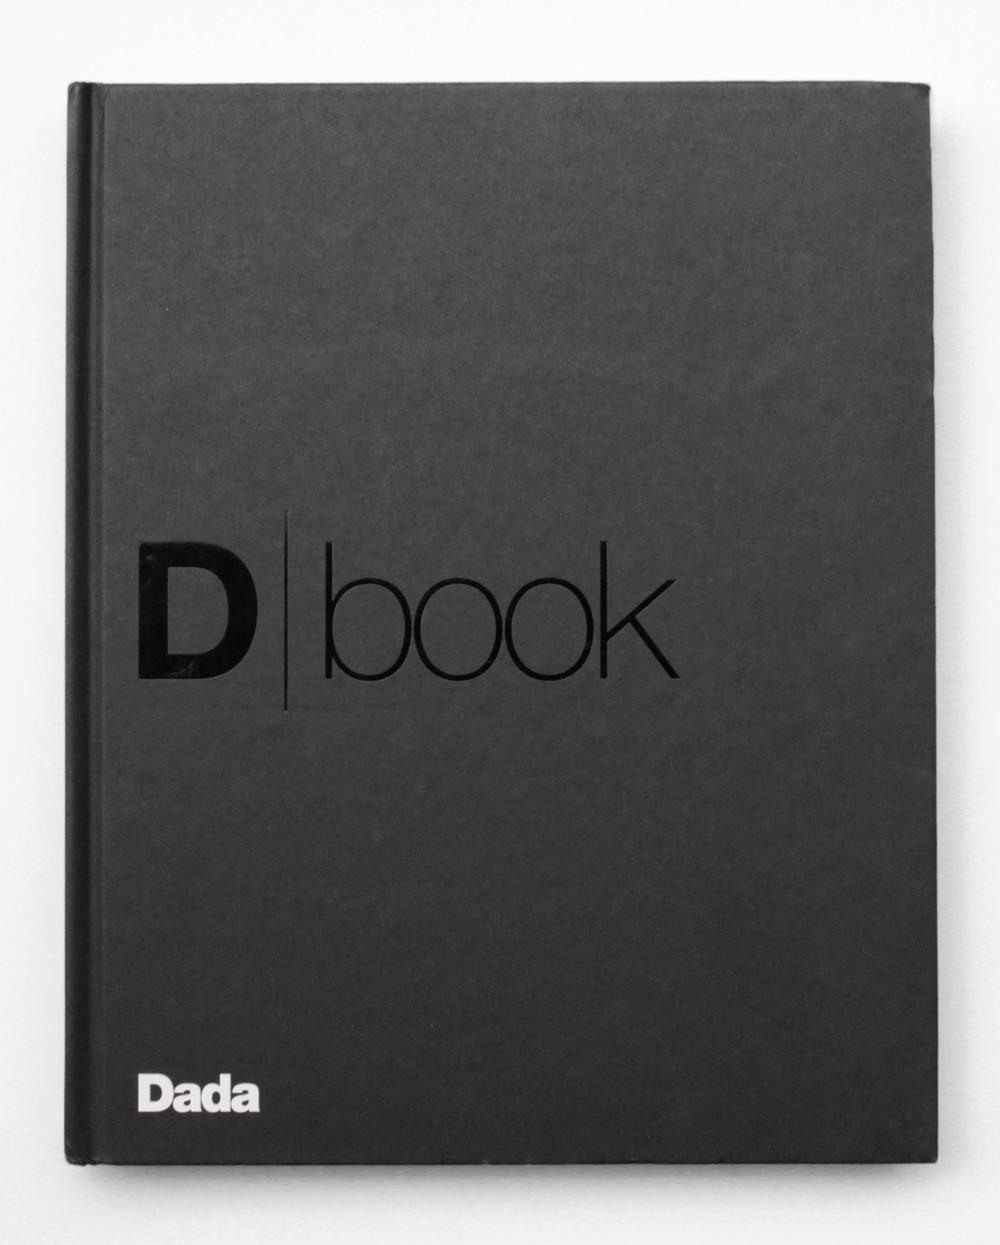 01_Dada Dbook 2014_Andrea Martiradonna_Silvia Fanticelli